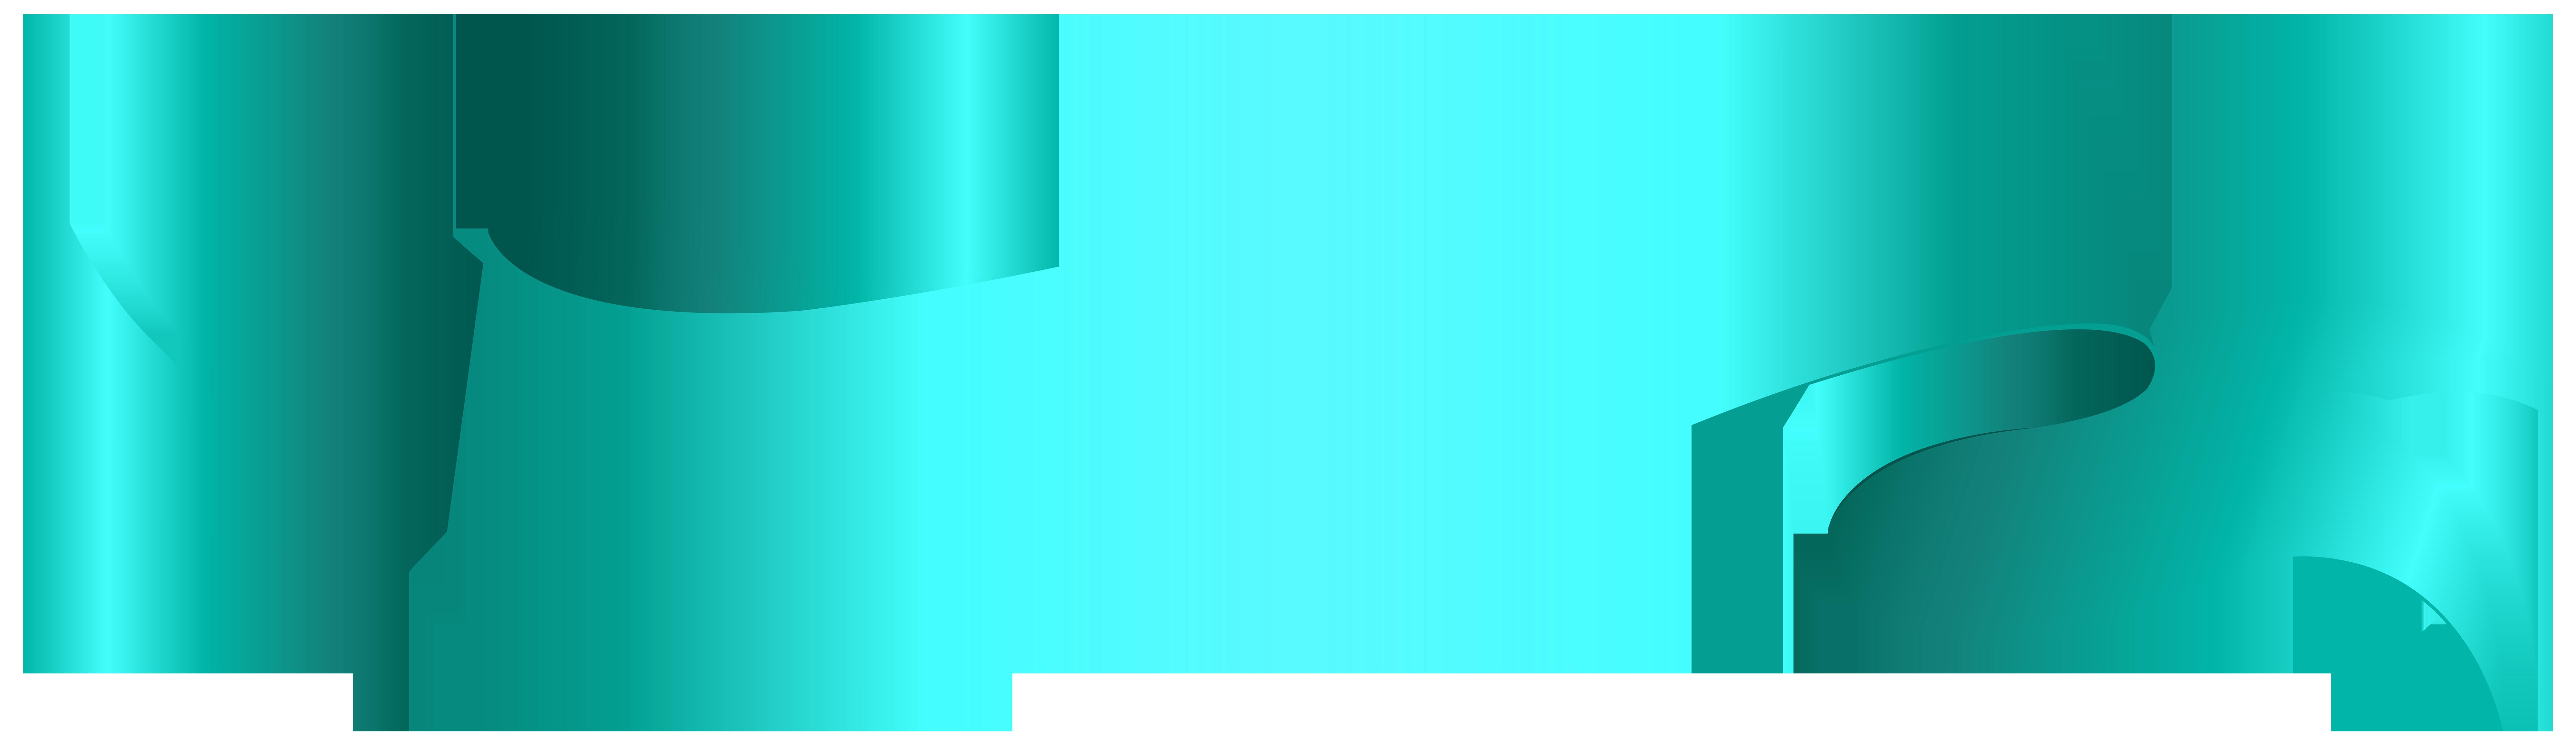 Banner Blue PNG Clip Art Transparent Image.